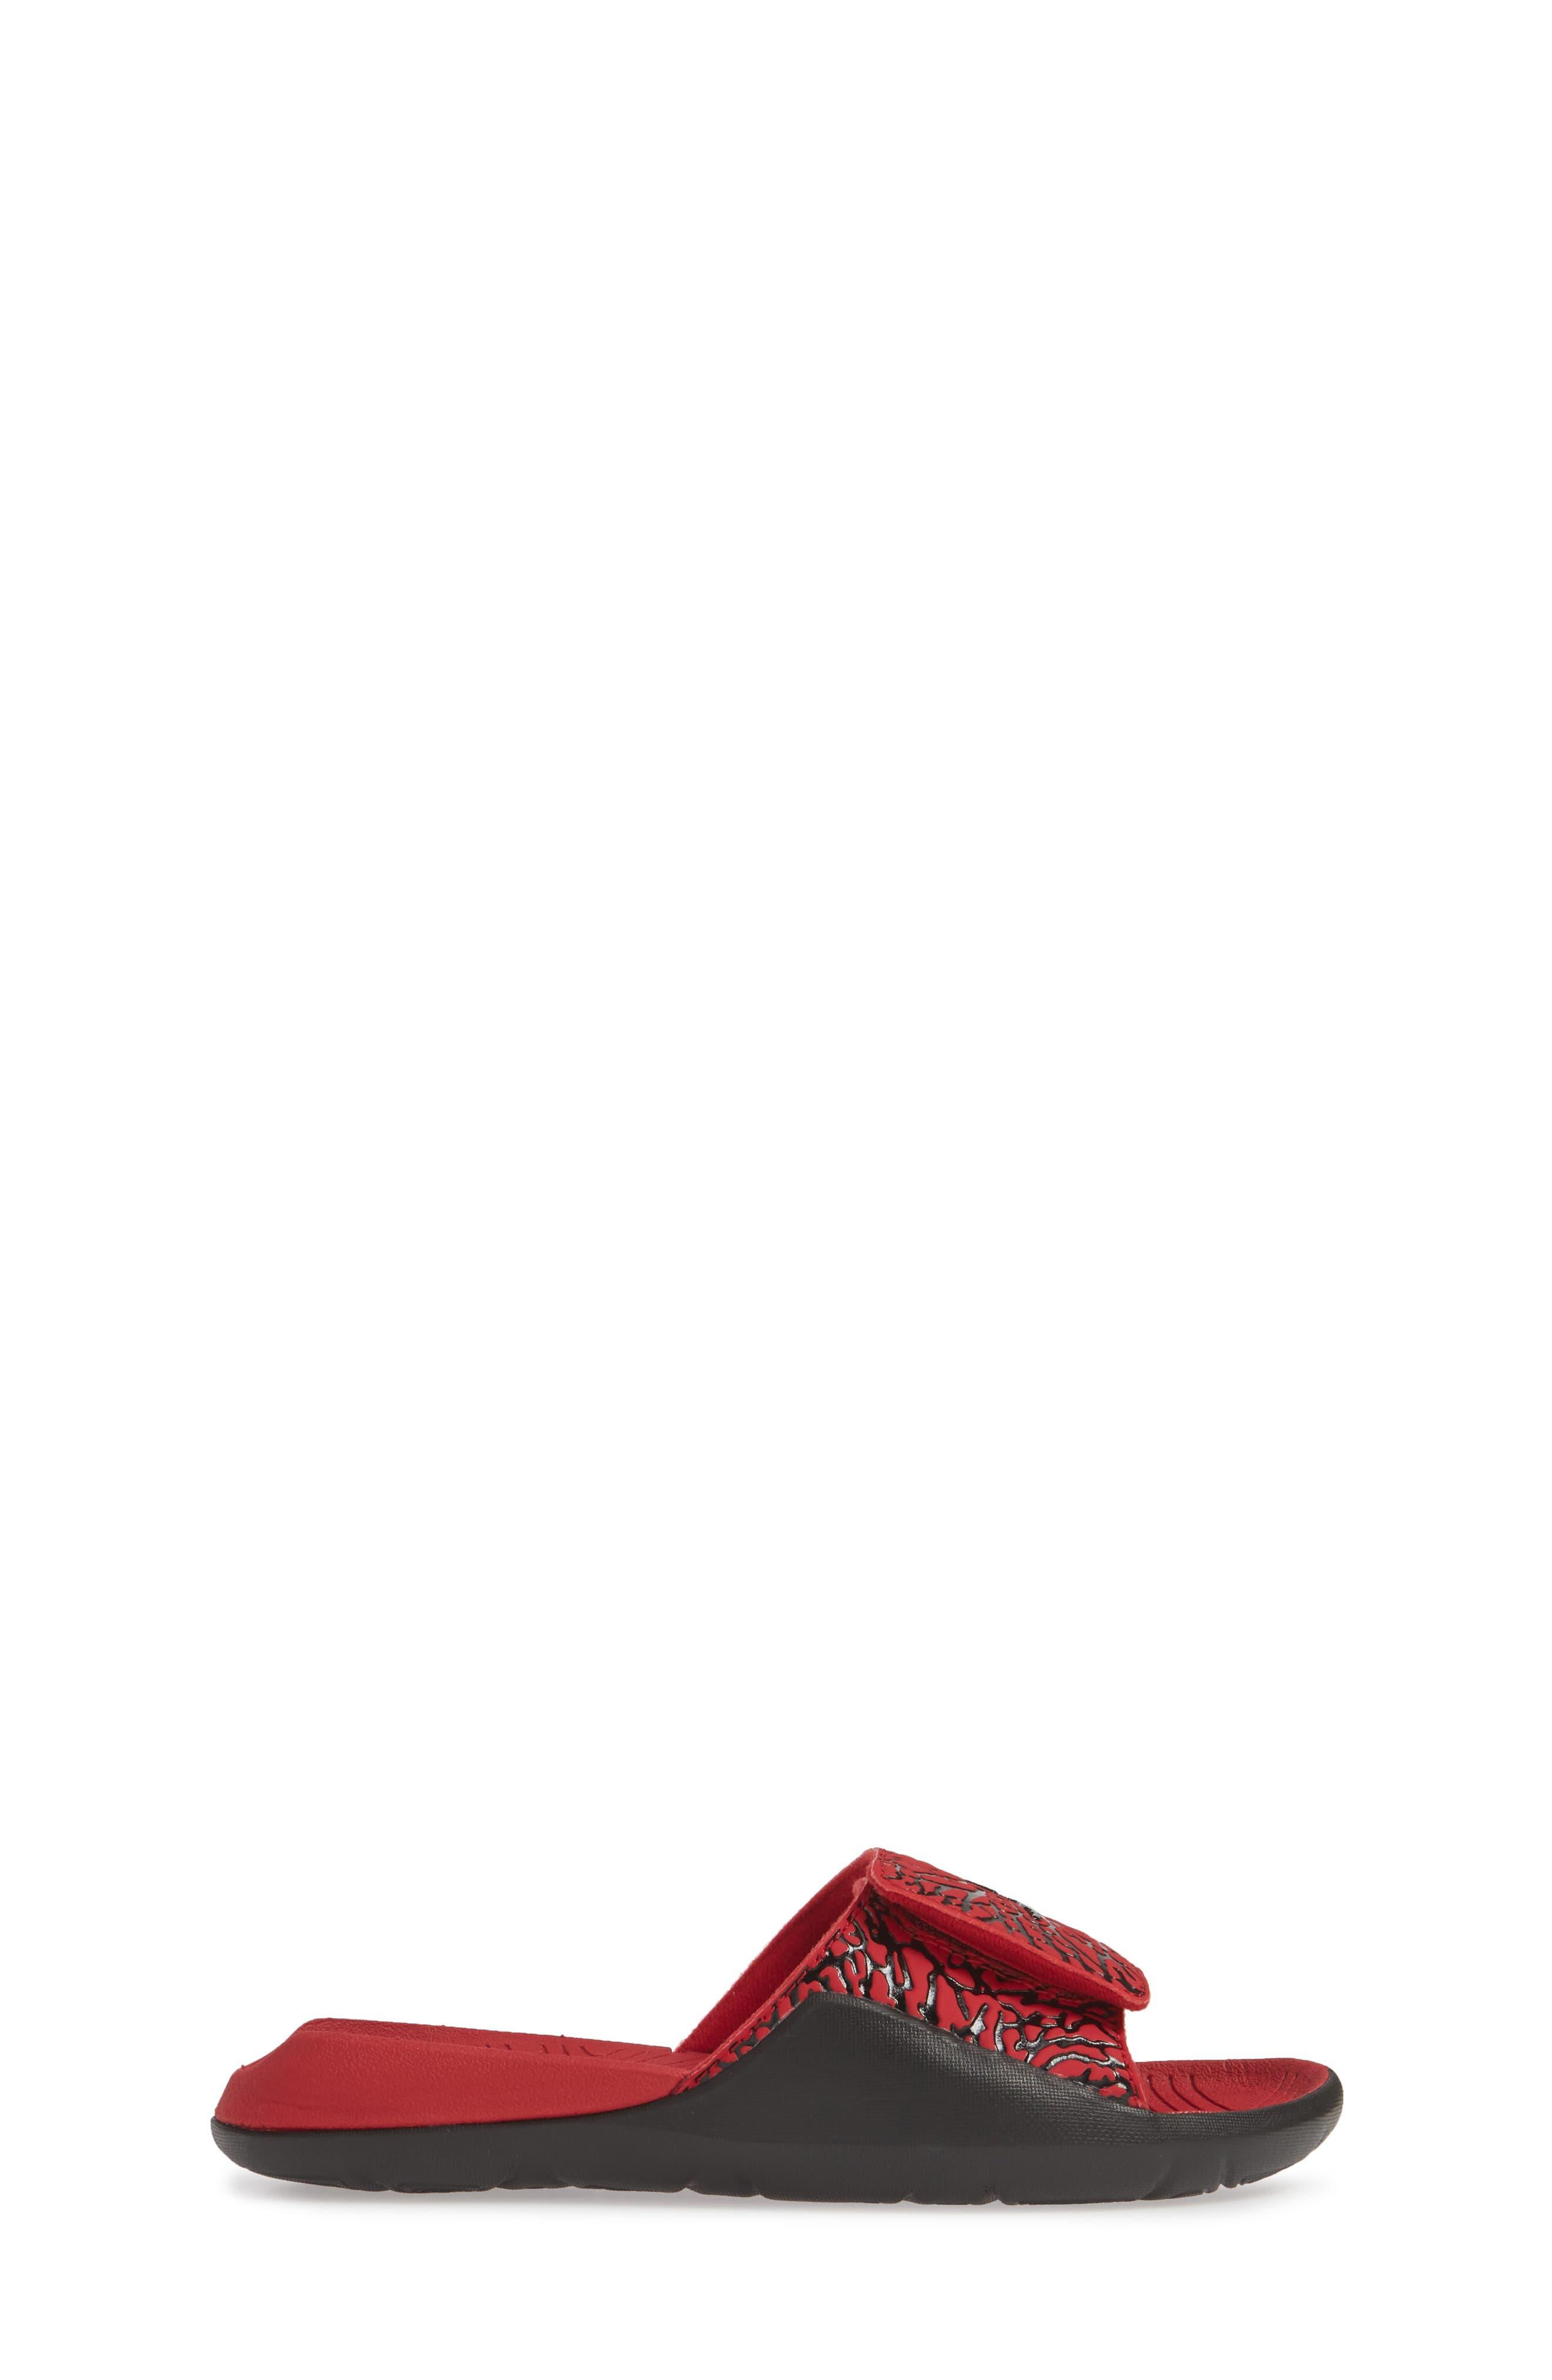 JORDAN, Hydro 7 V2 Sandal, Alternate thumbnail 3, color, GYM RED/ BLACK